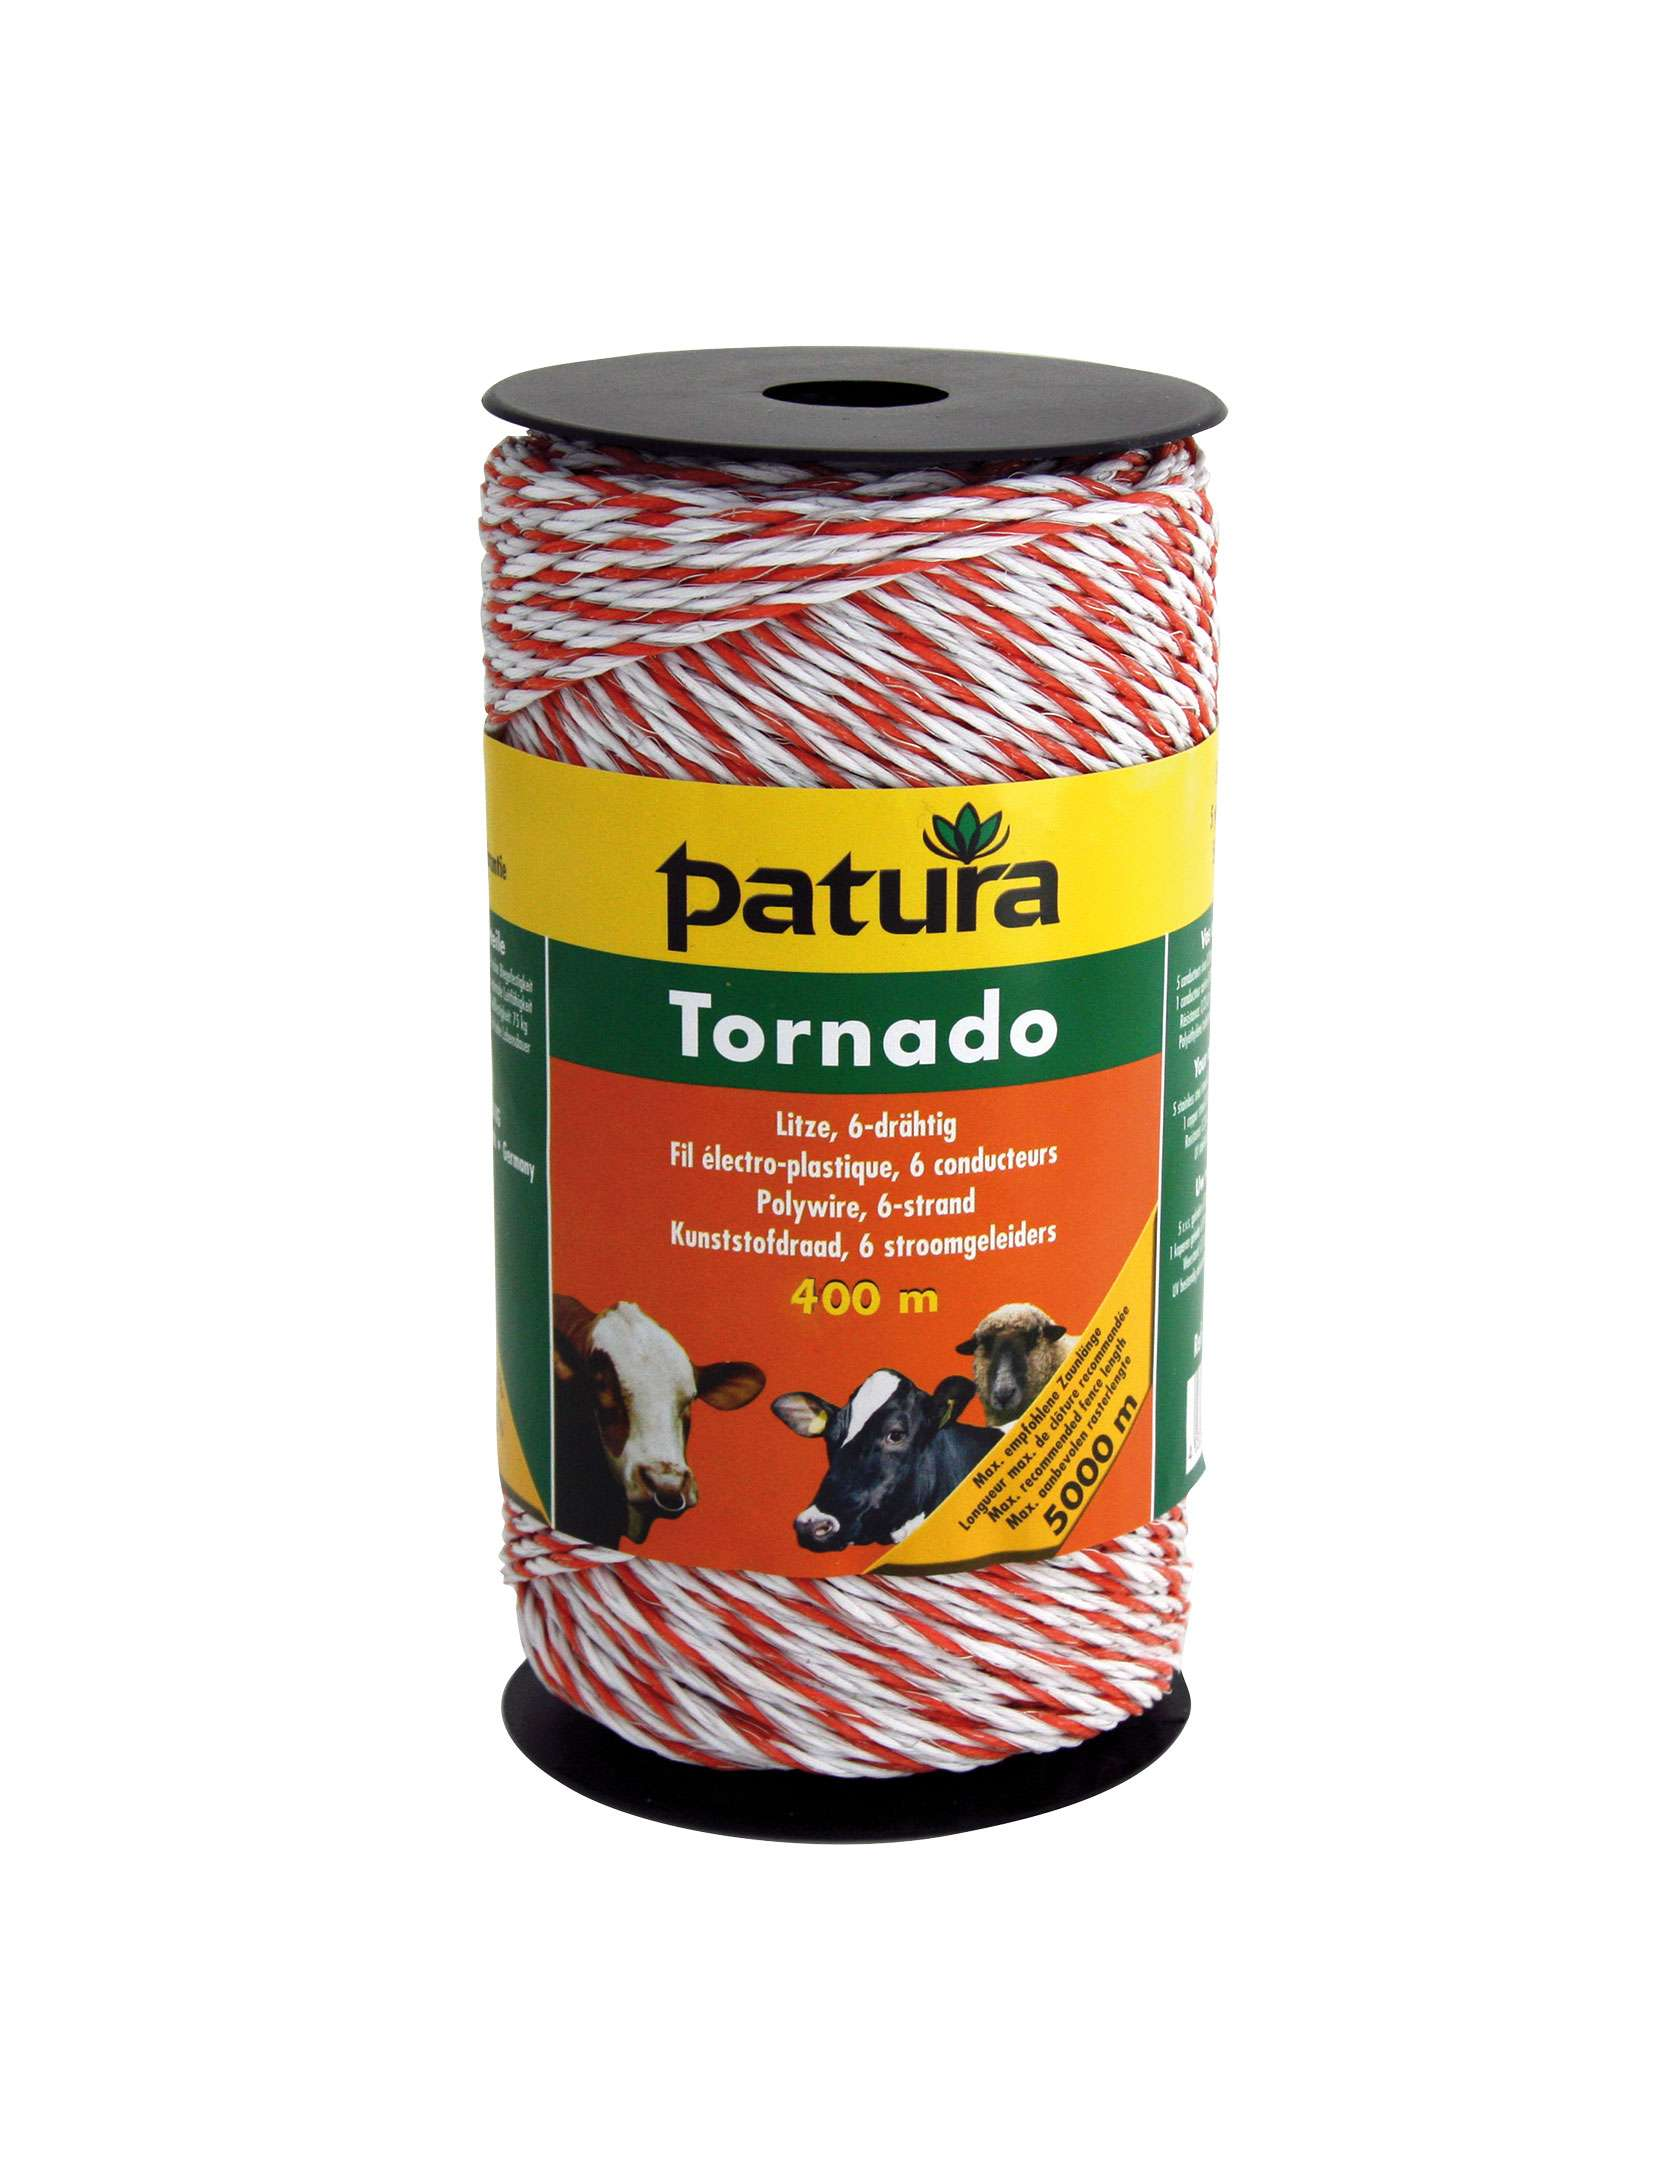 PATURA Tornado Litze weiß-orange - 400 m